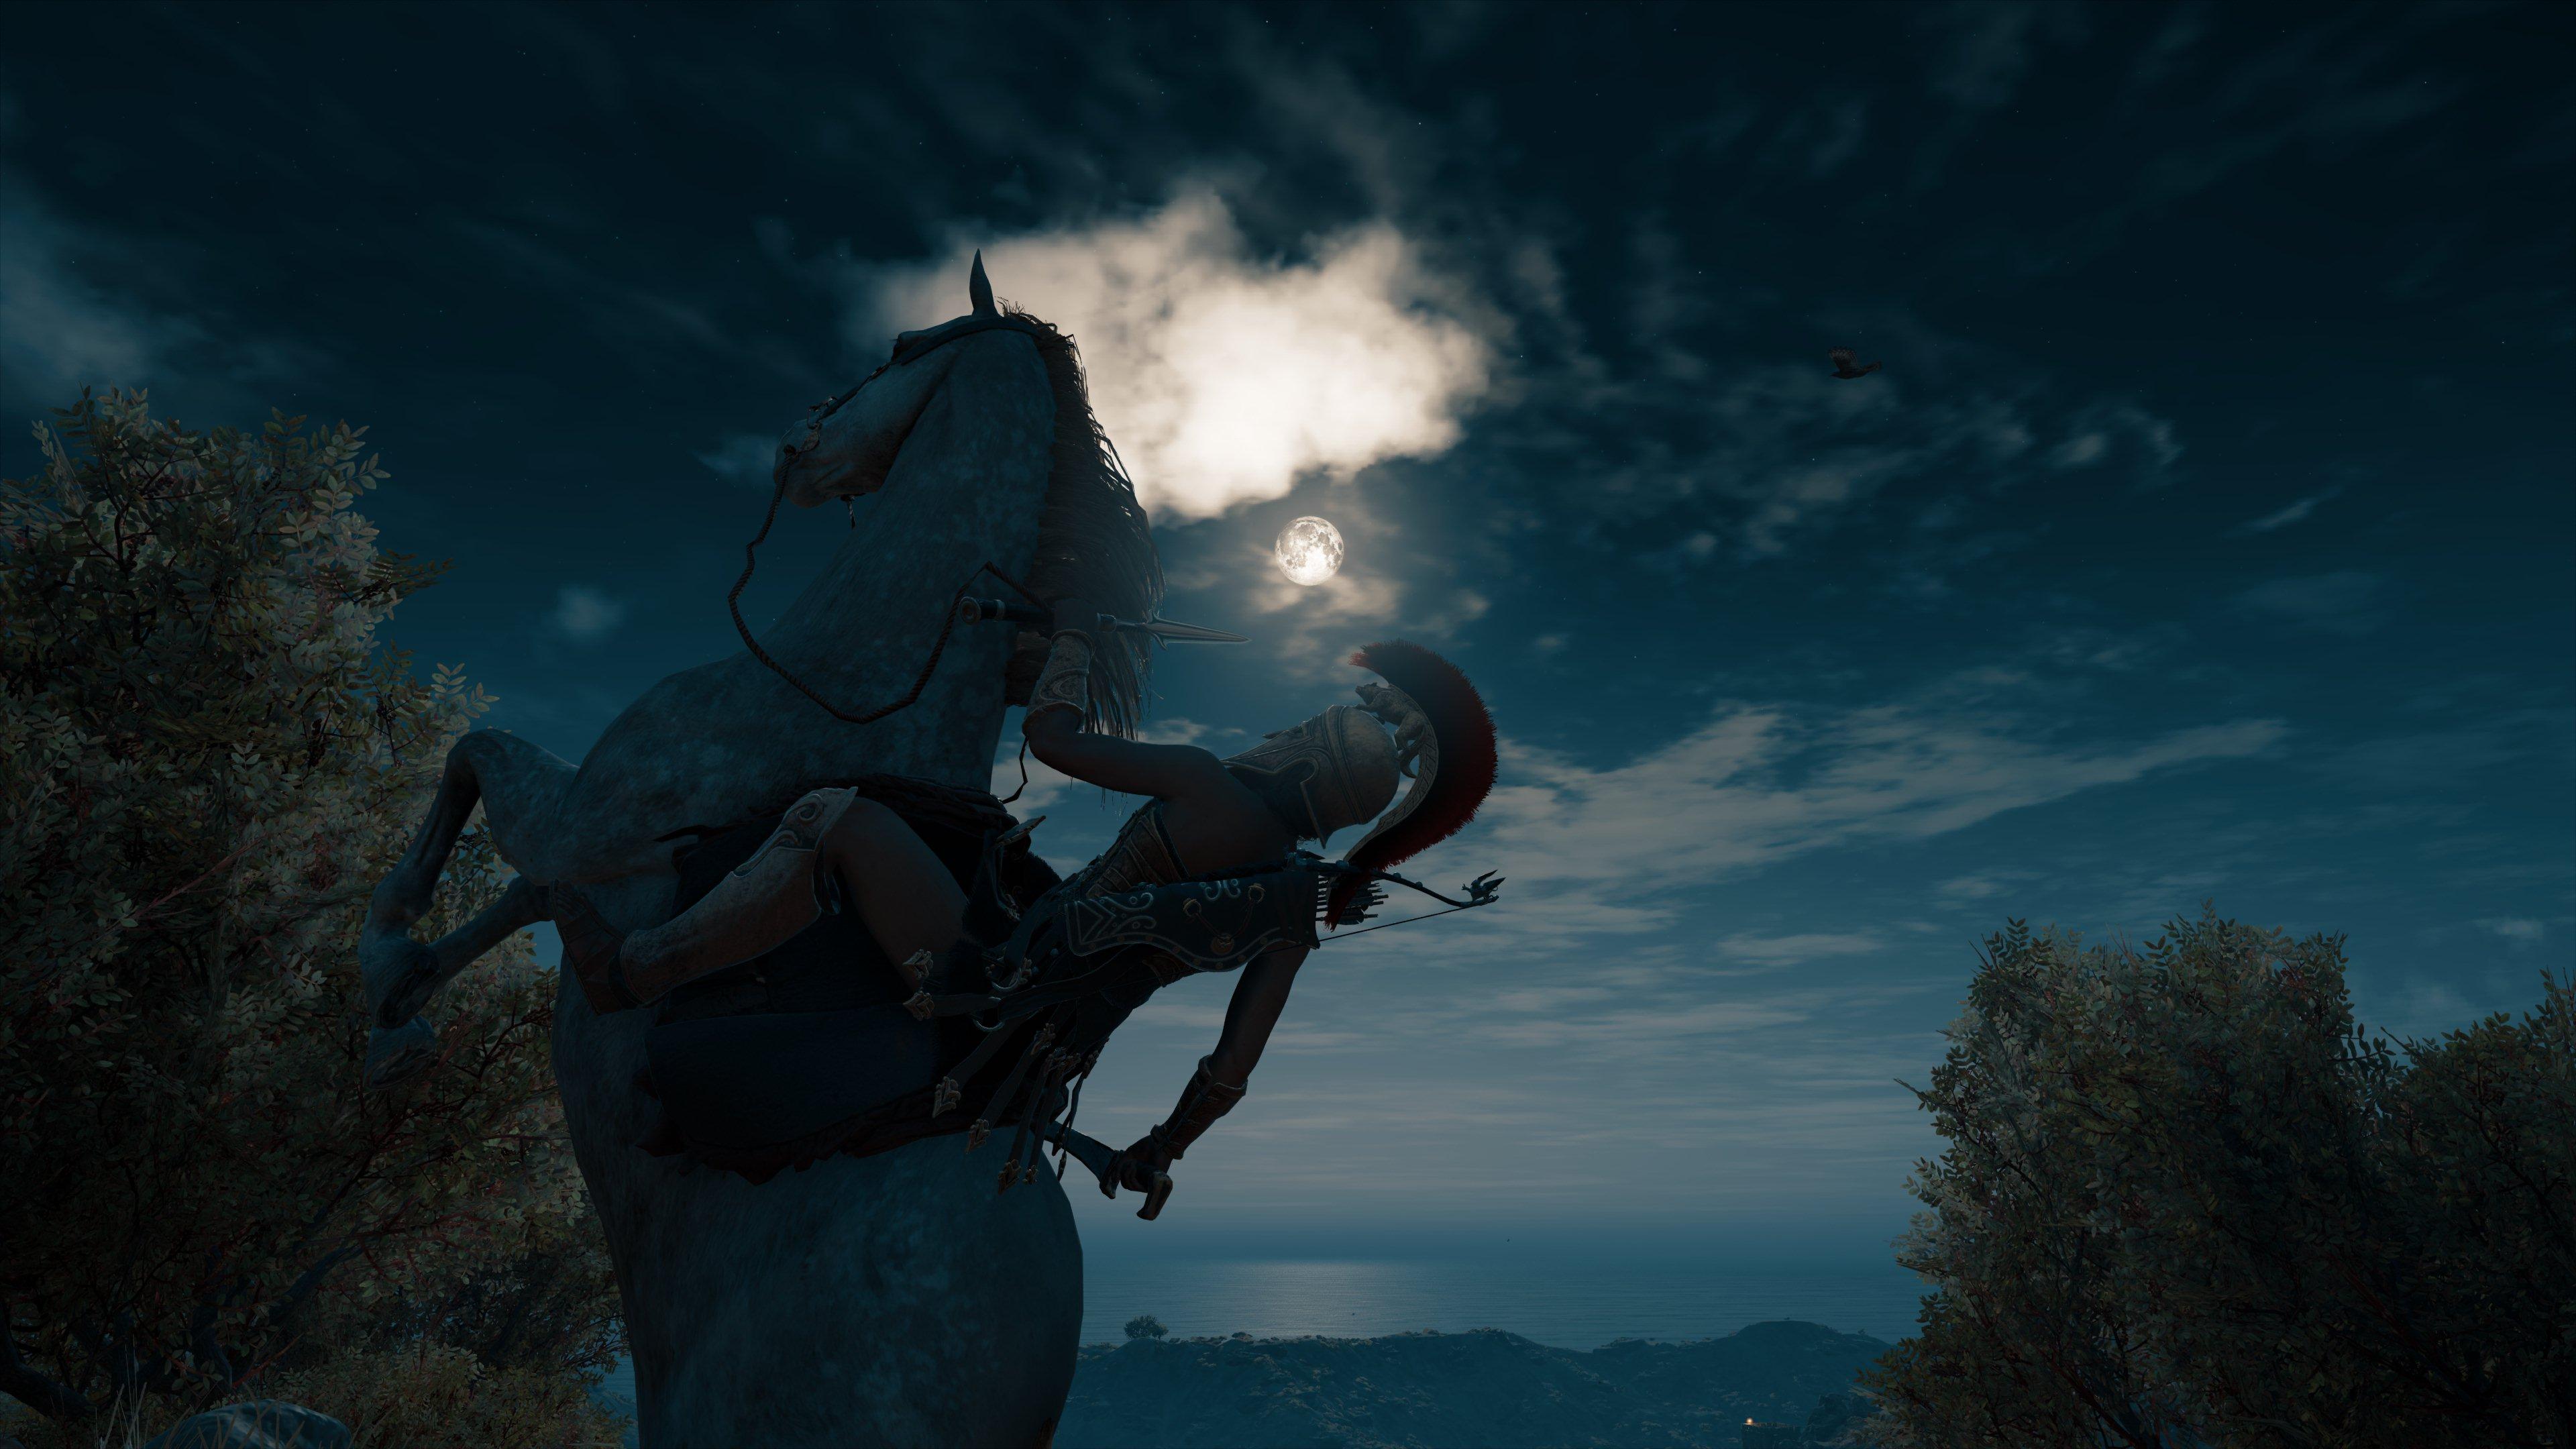 20181031163011.jpg - Assassin's Creed: Odyssey